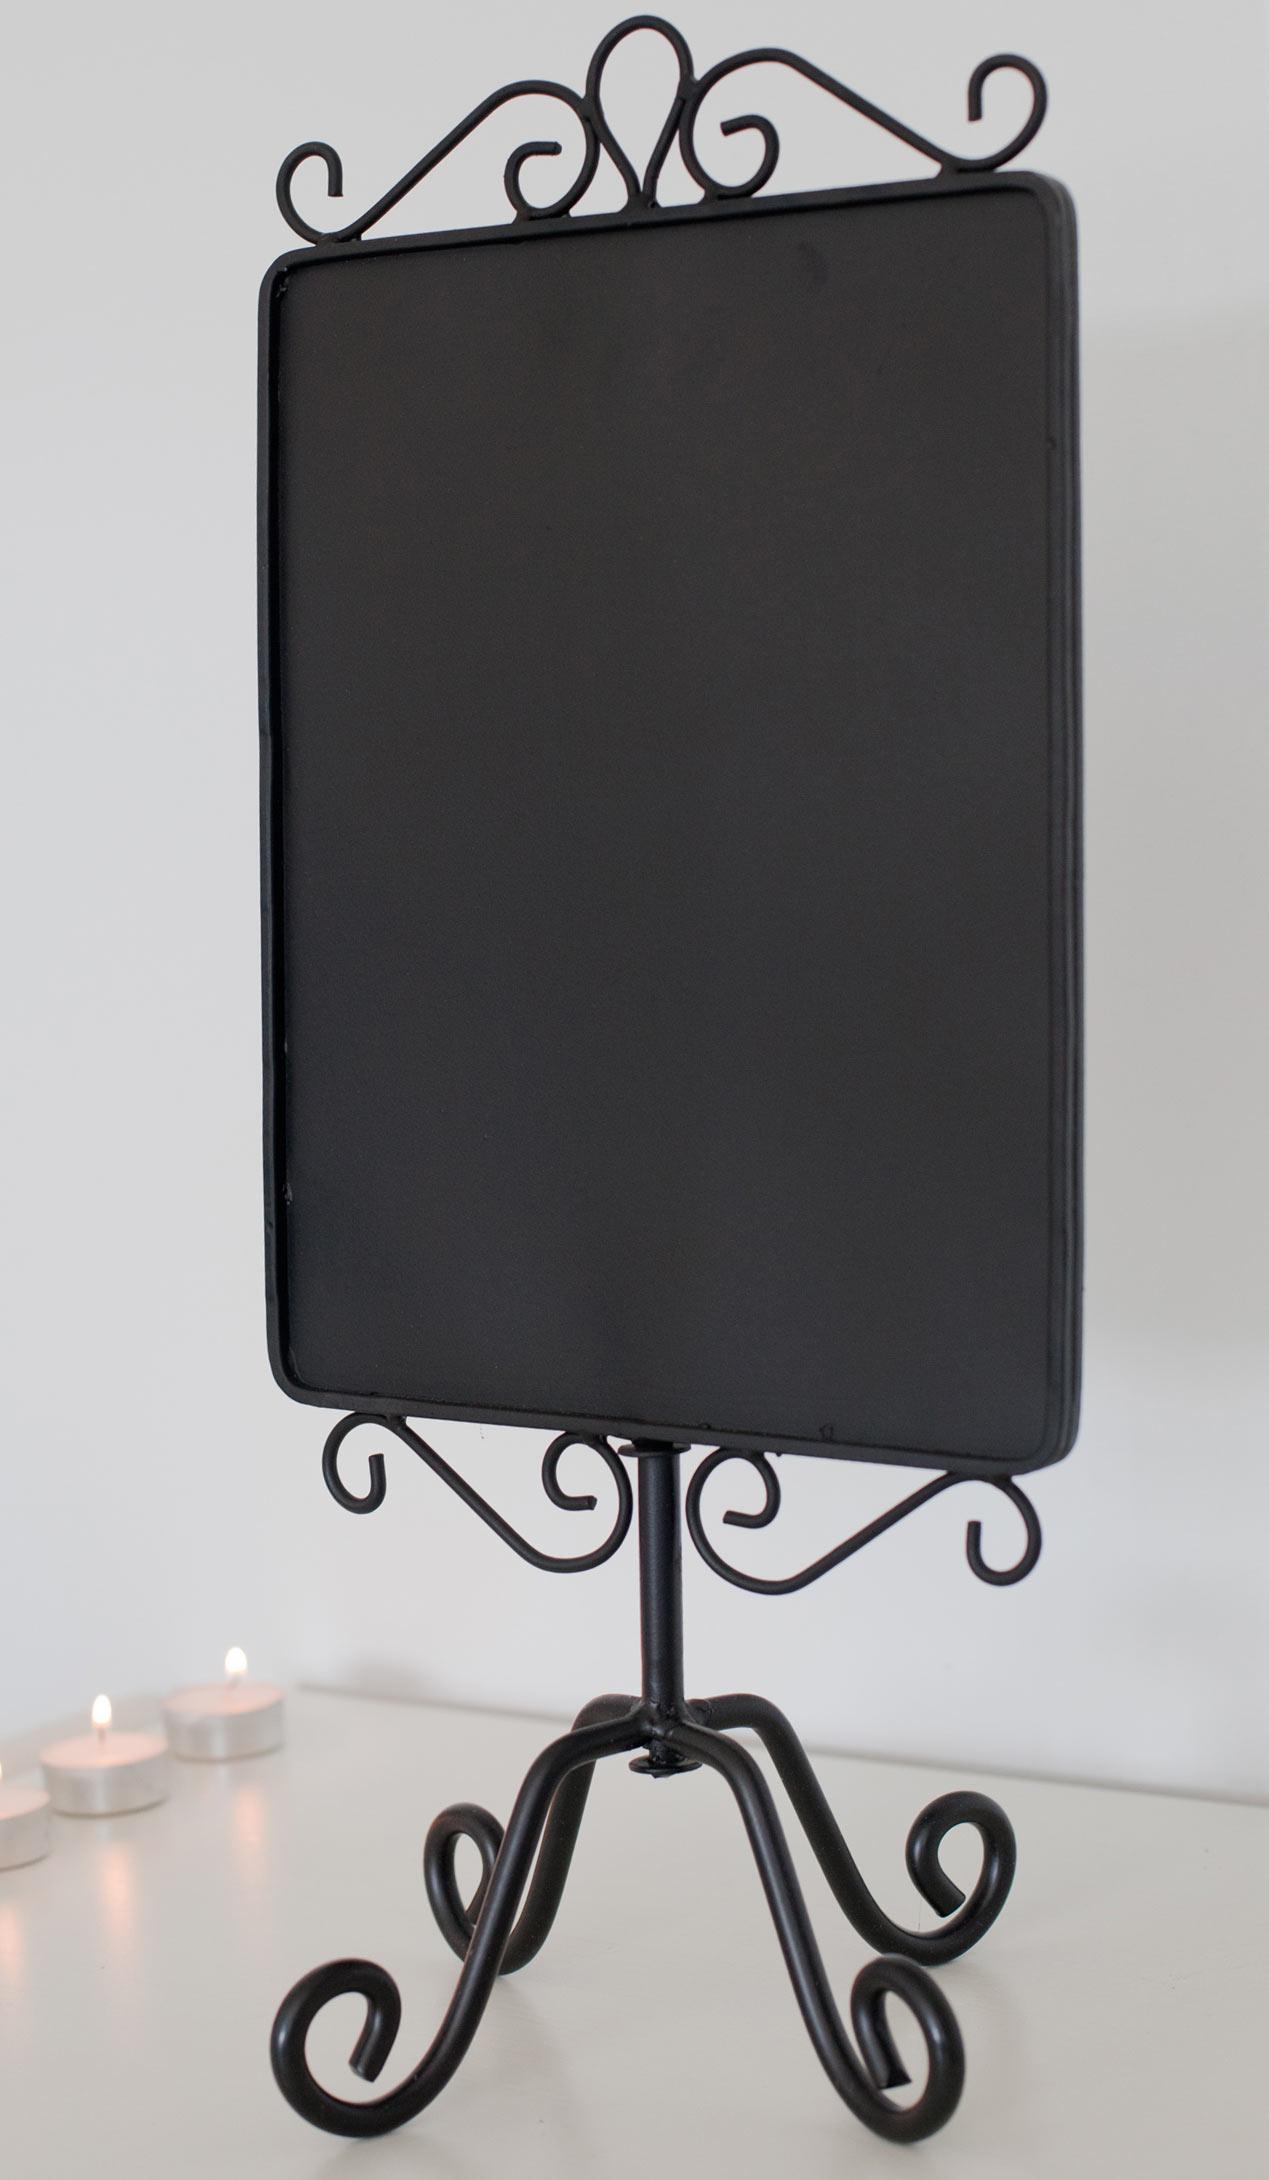 Blackboard on Stand - Sml